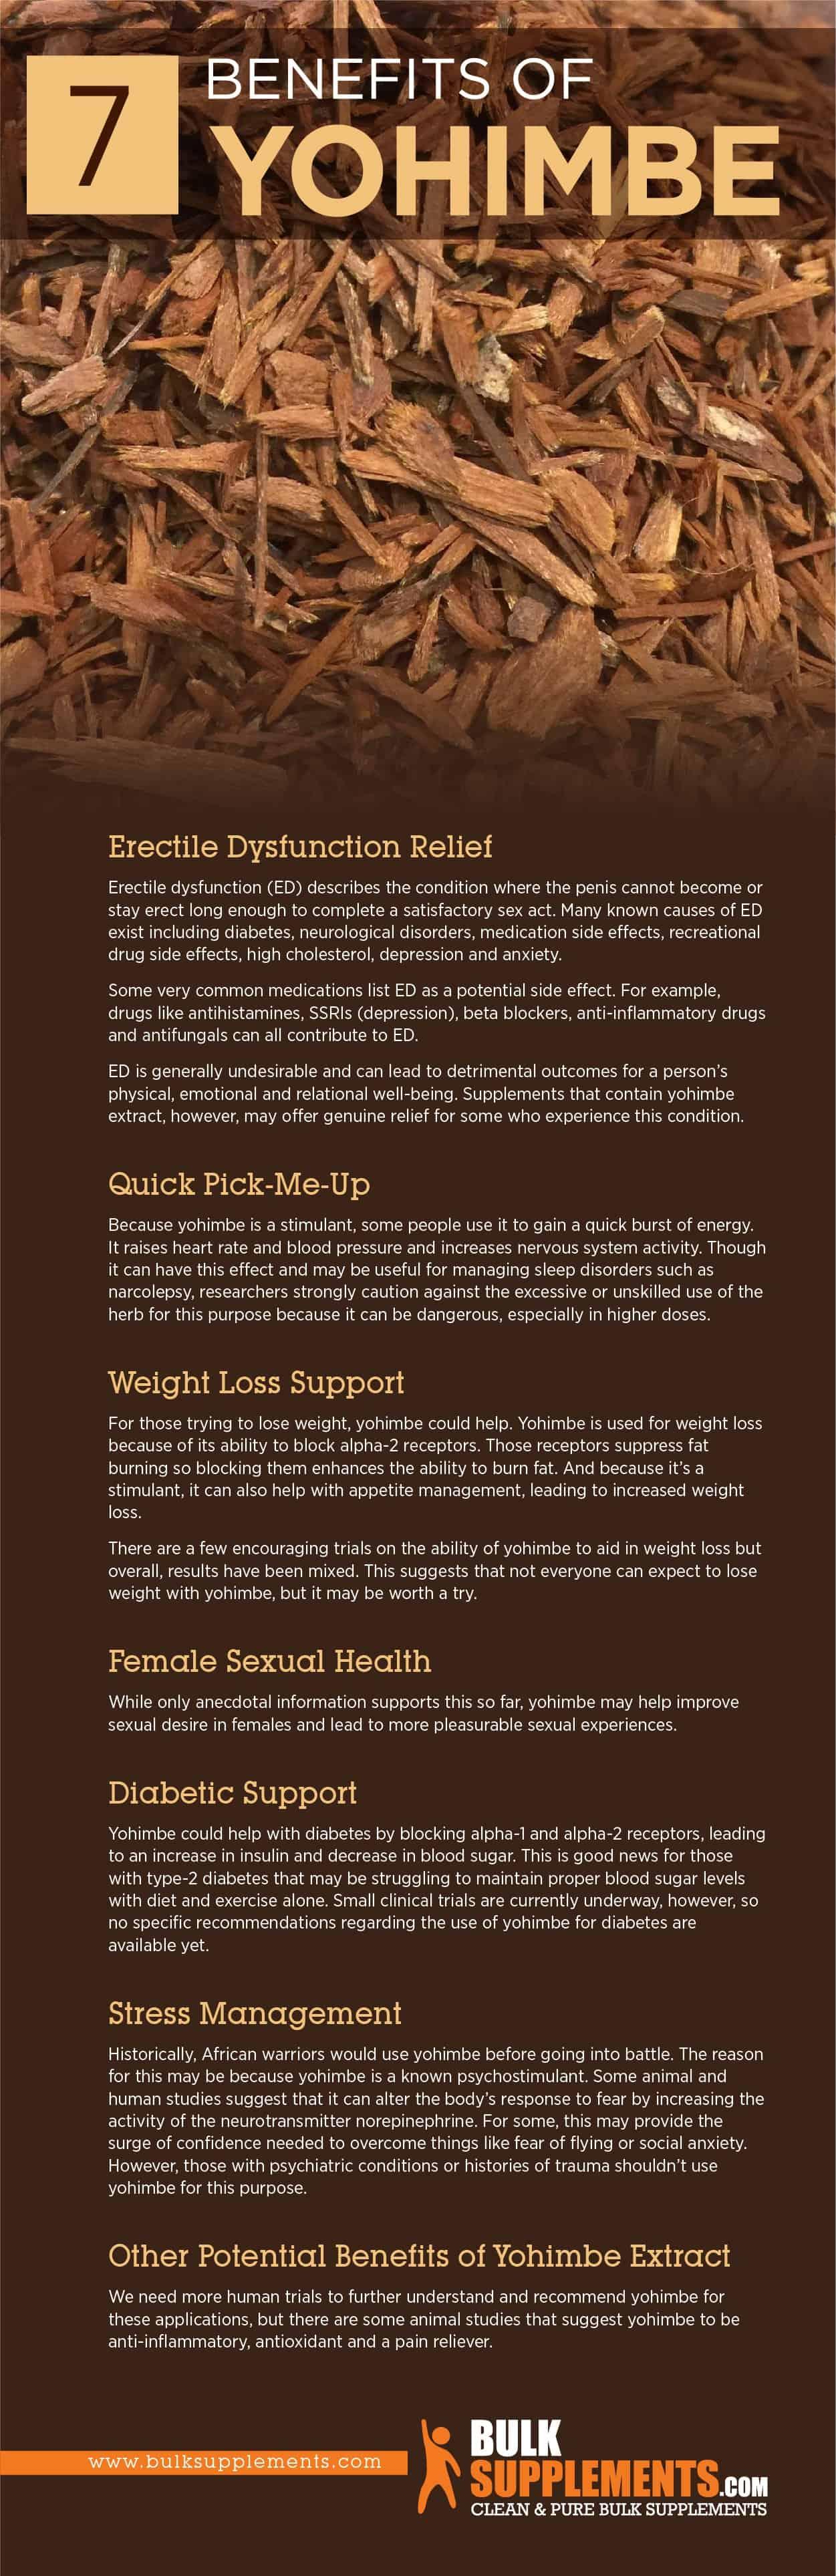 Yohimbe Benefits